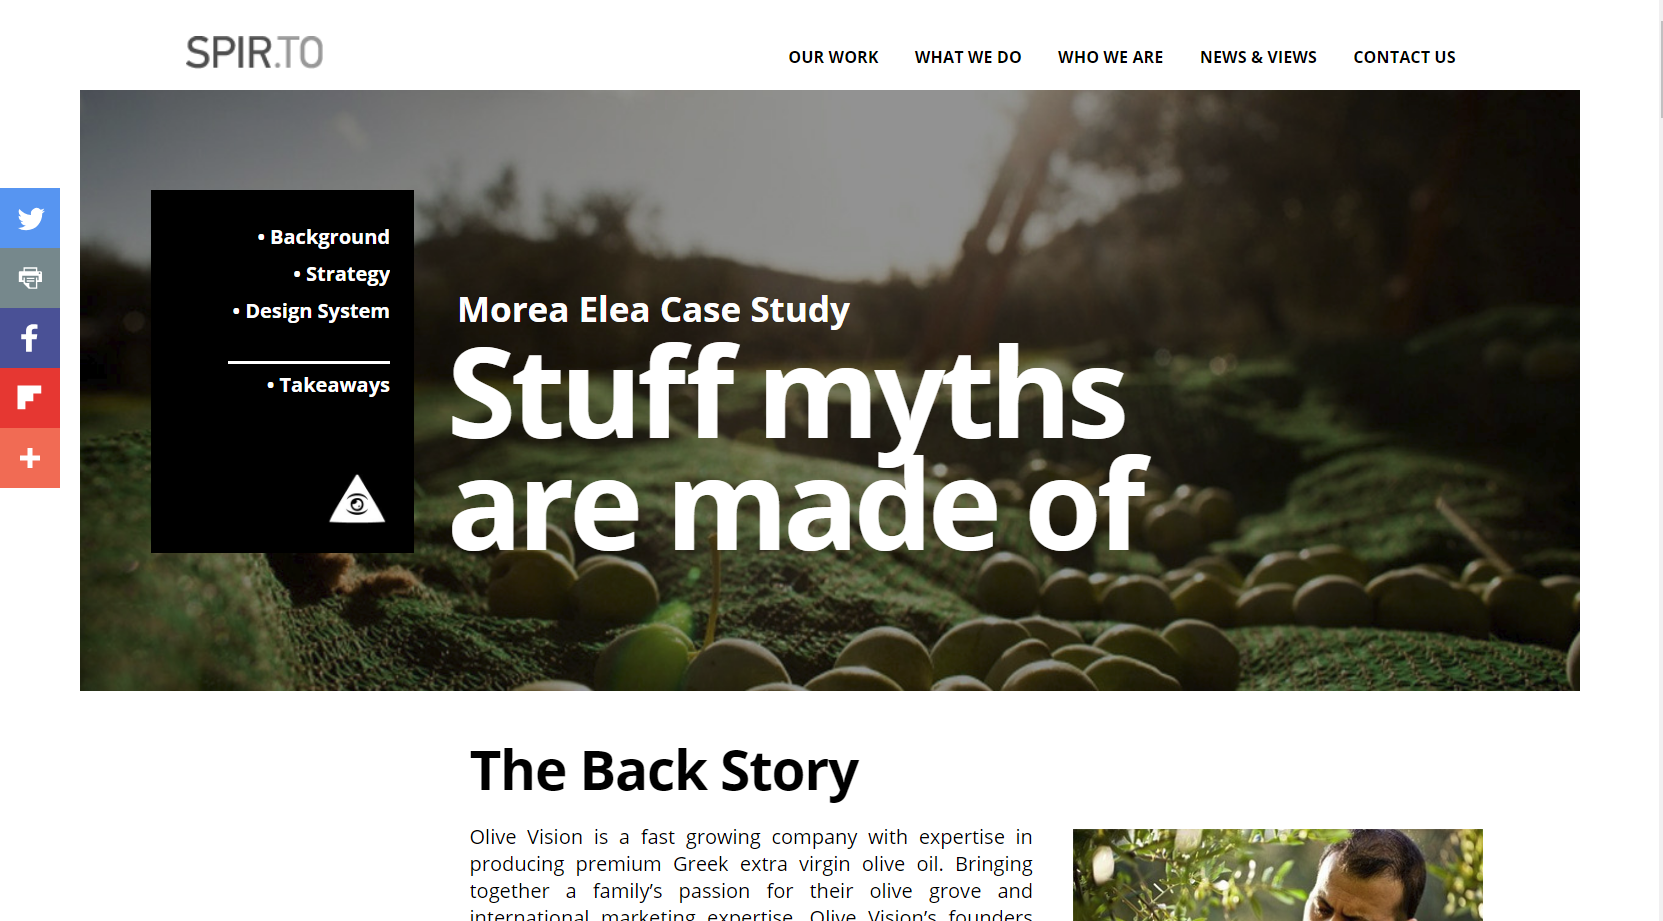 agency spirto case study morea elea